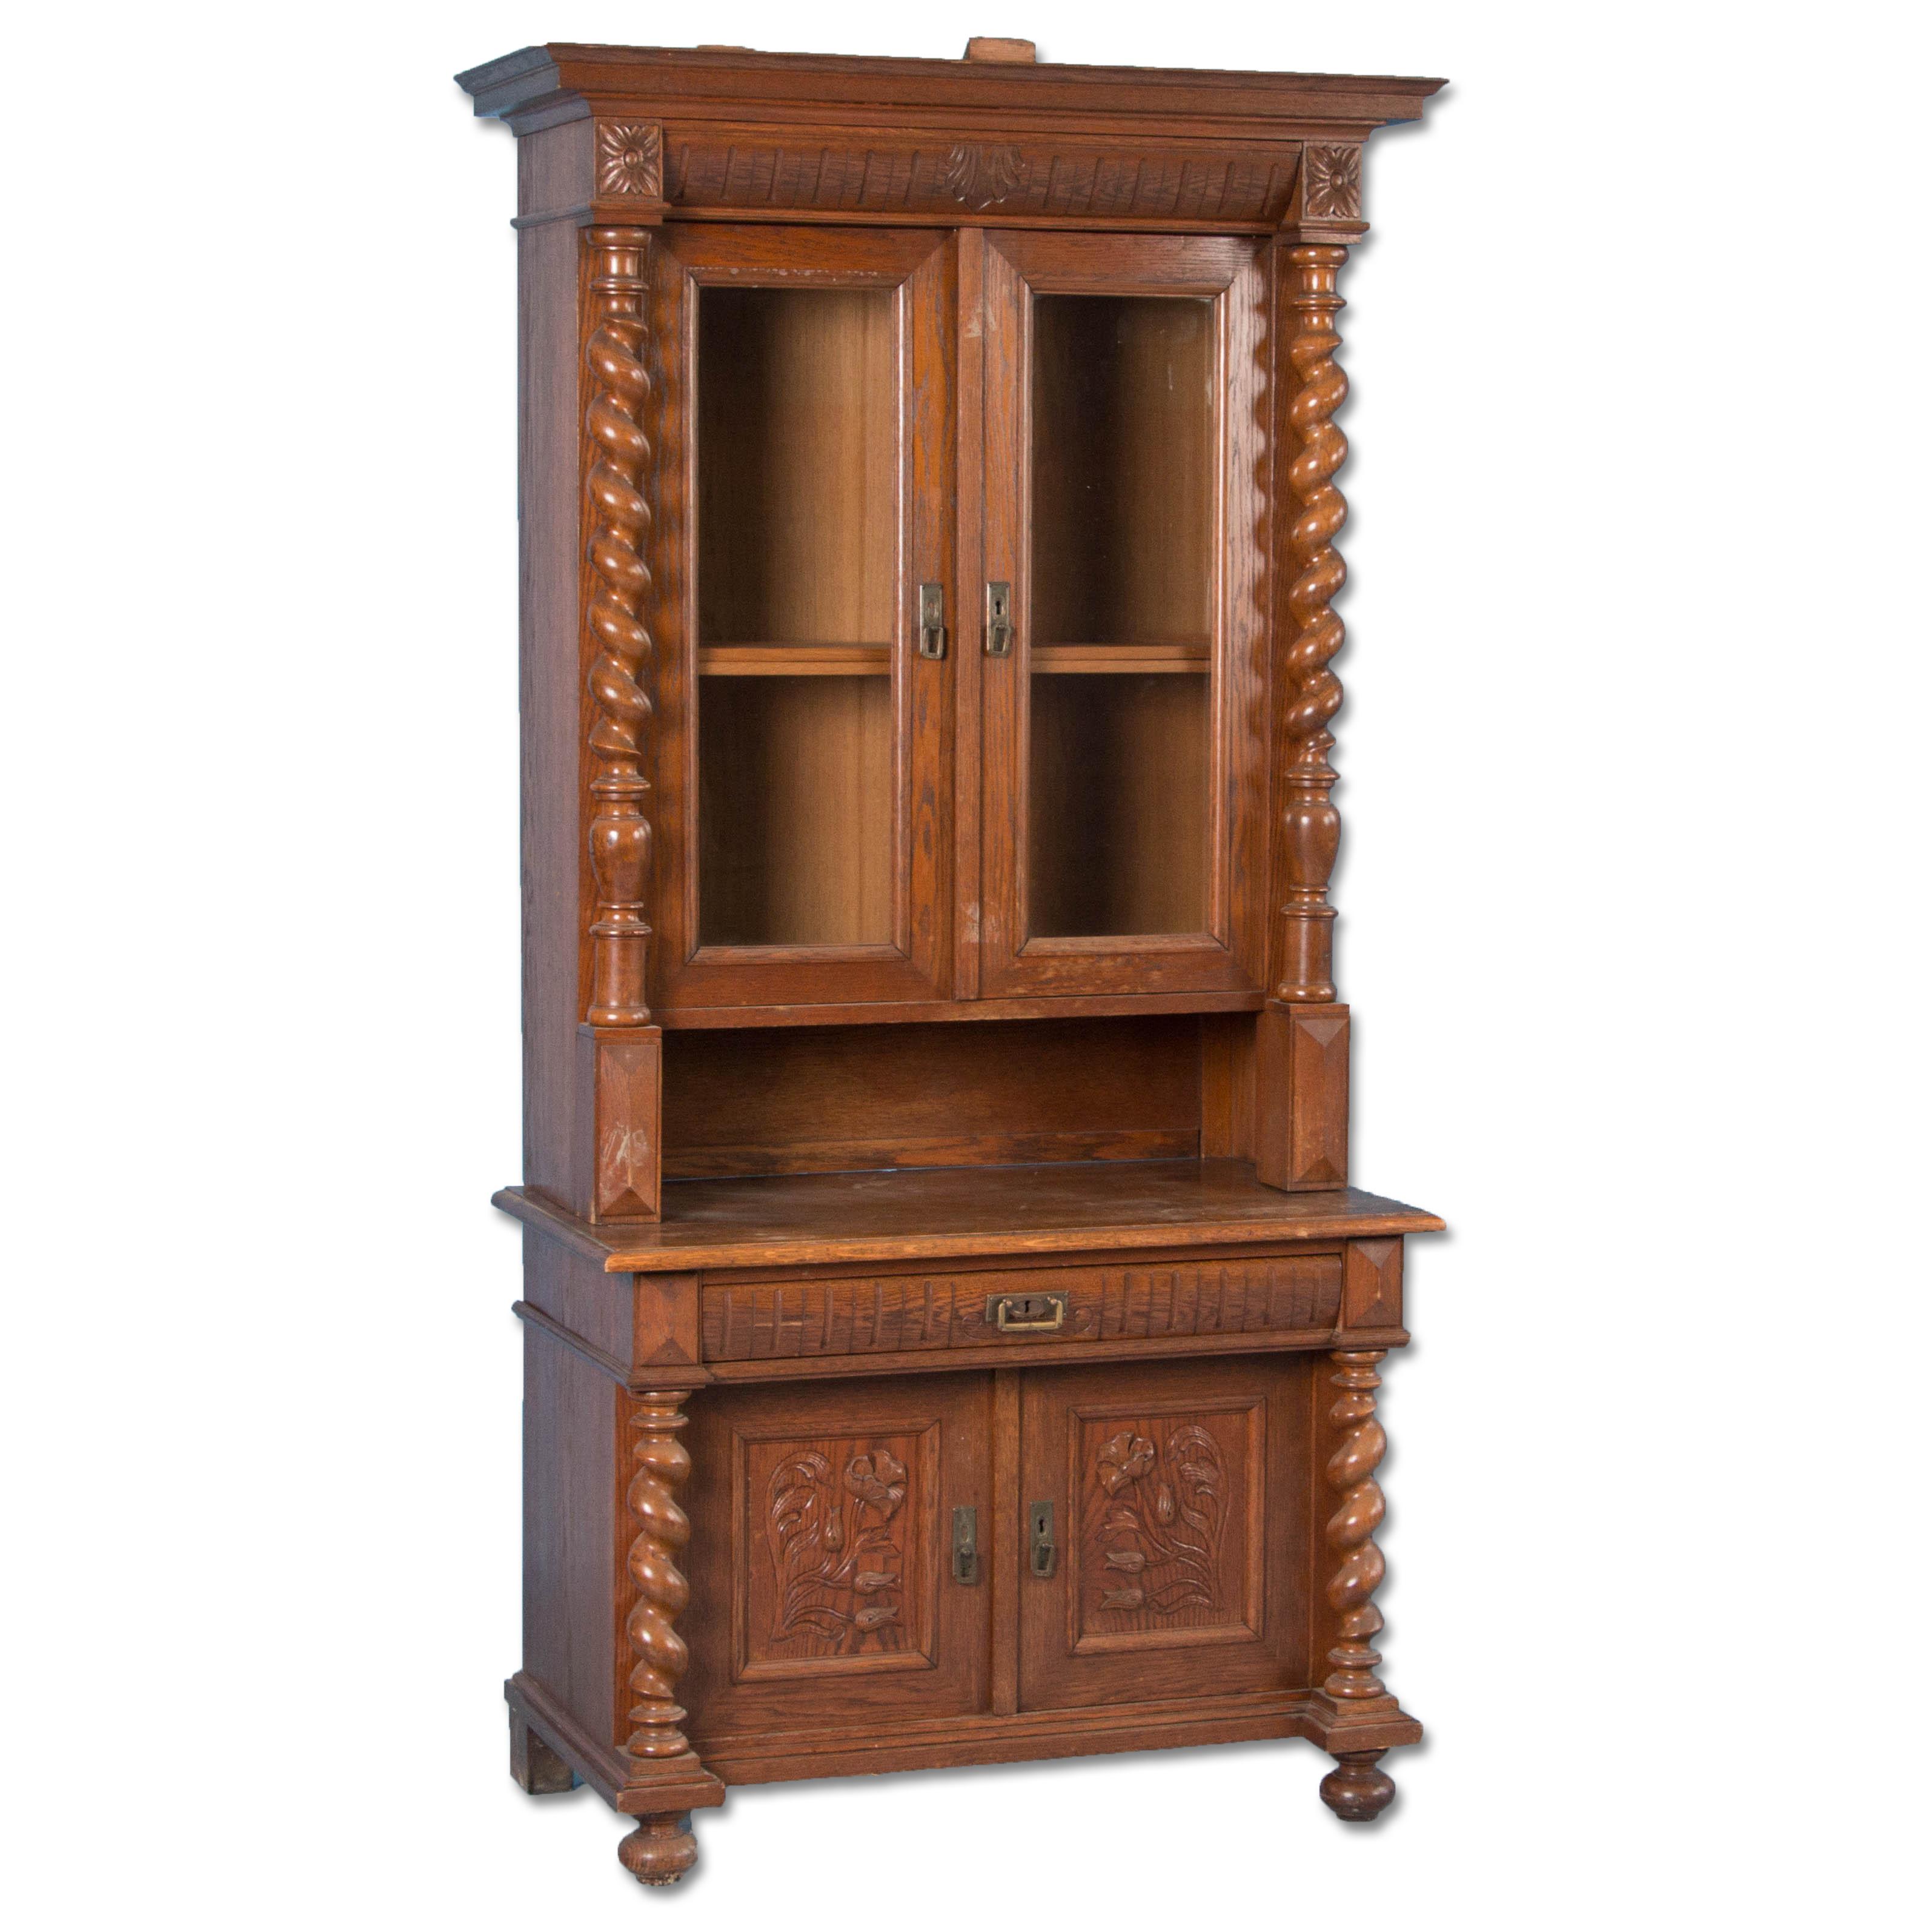 Antique 19th Century Danish Barley Twist Oak Bookcase